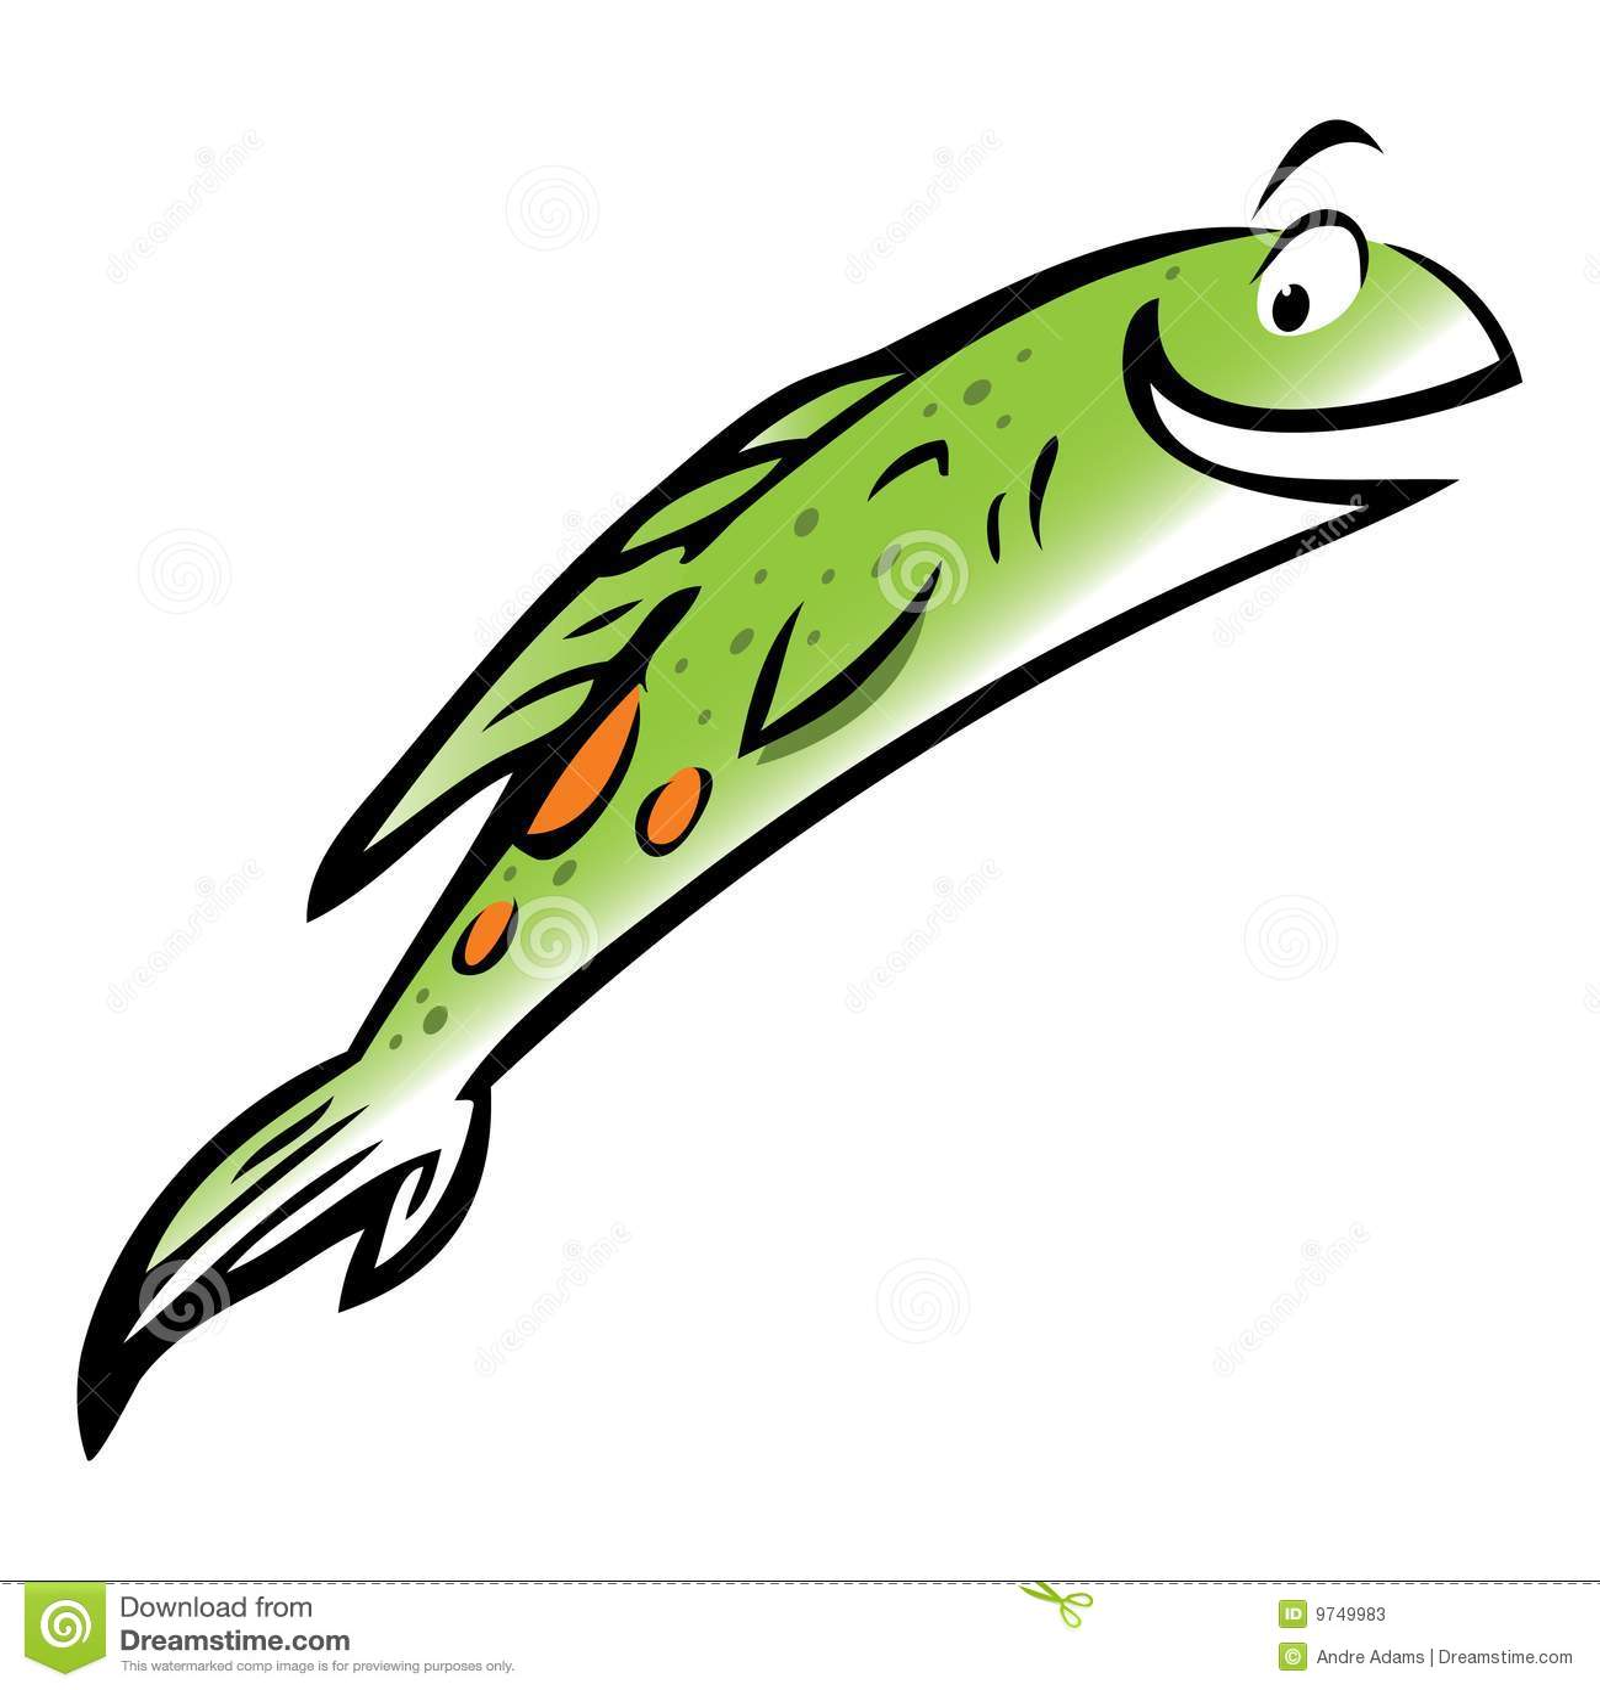 Jumping Salmon Fish Stock Illustrations – 301 Jumping Salmon Fish ...